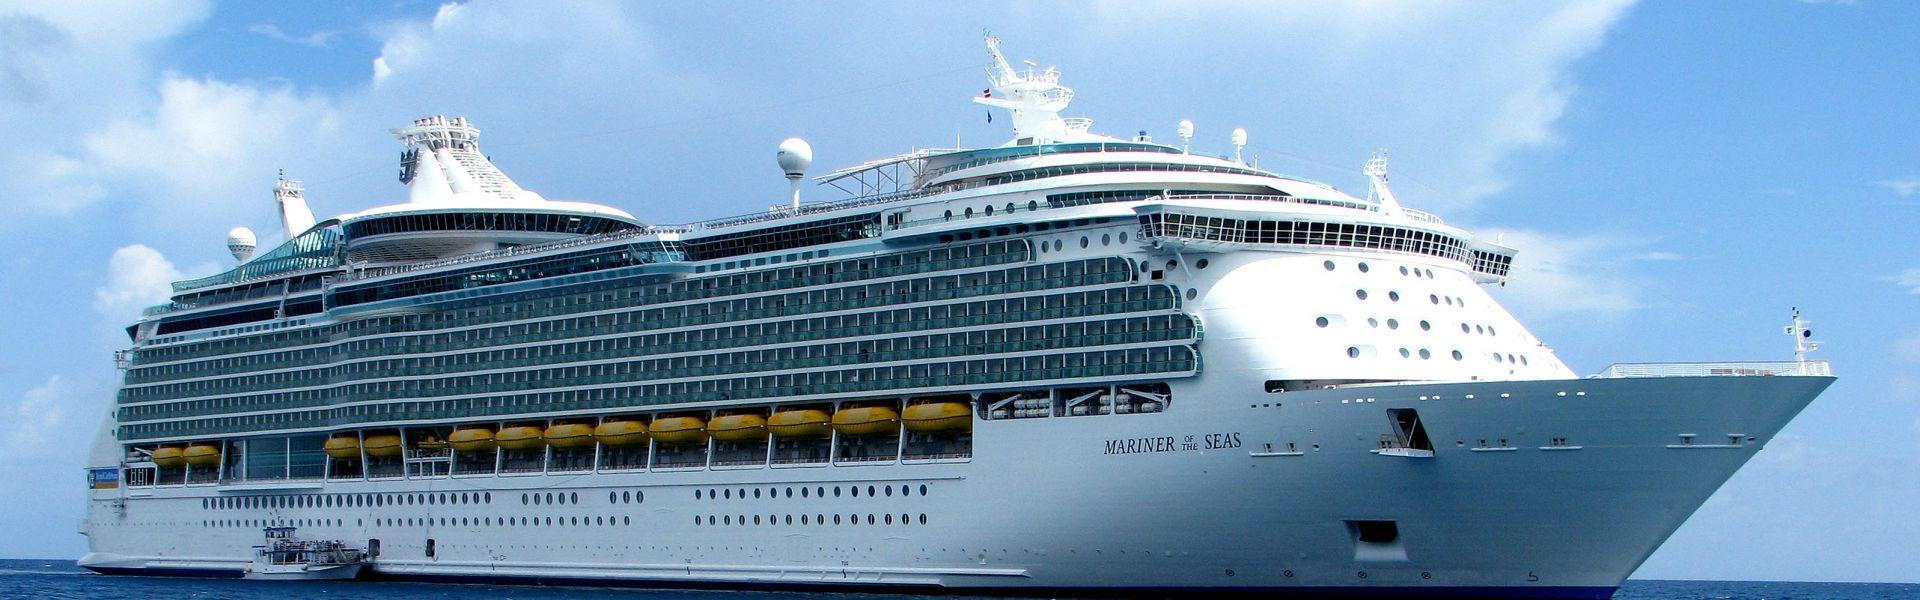 Croaziere 2017 - Asia de Sud (Singapore) - Royal Caribbean Cruise Line - Mariner of the Seas - 5 nopti